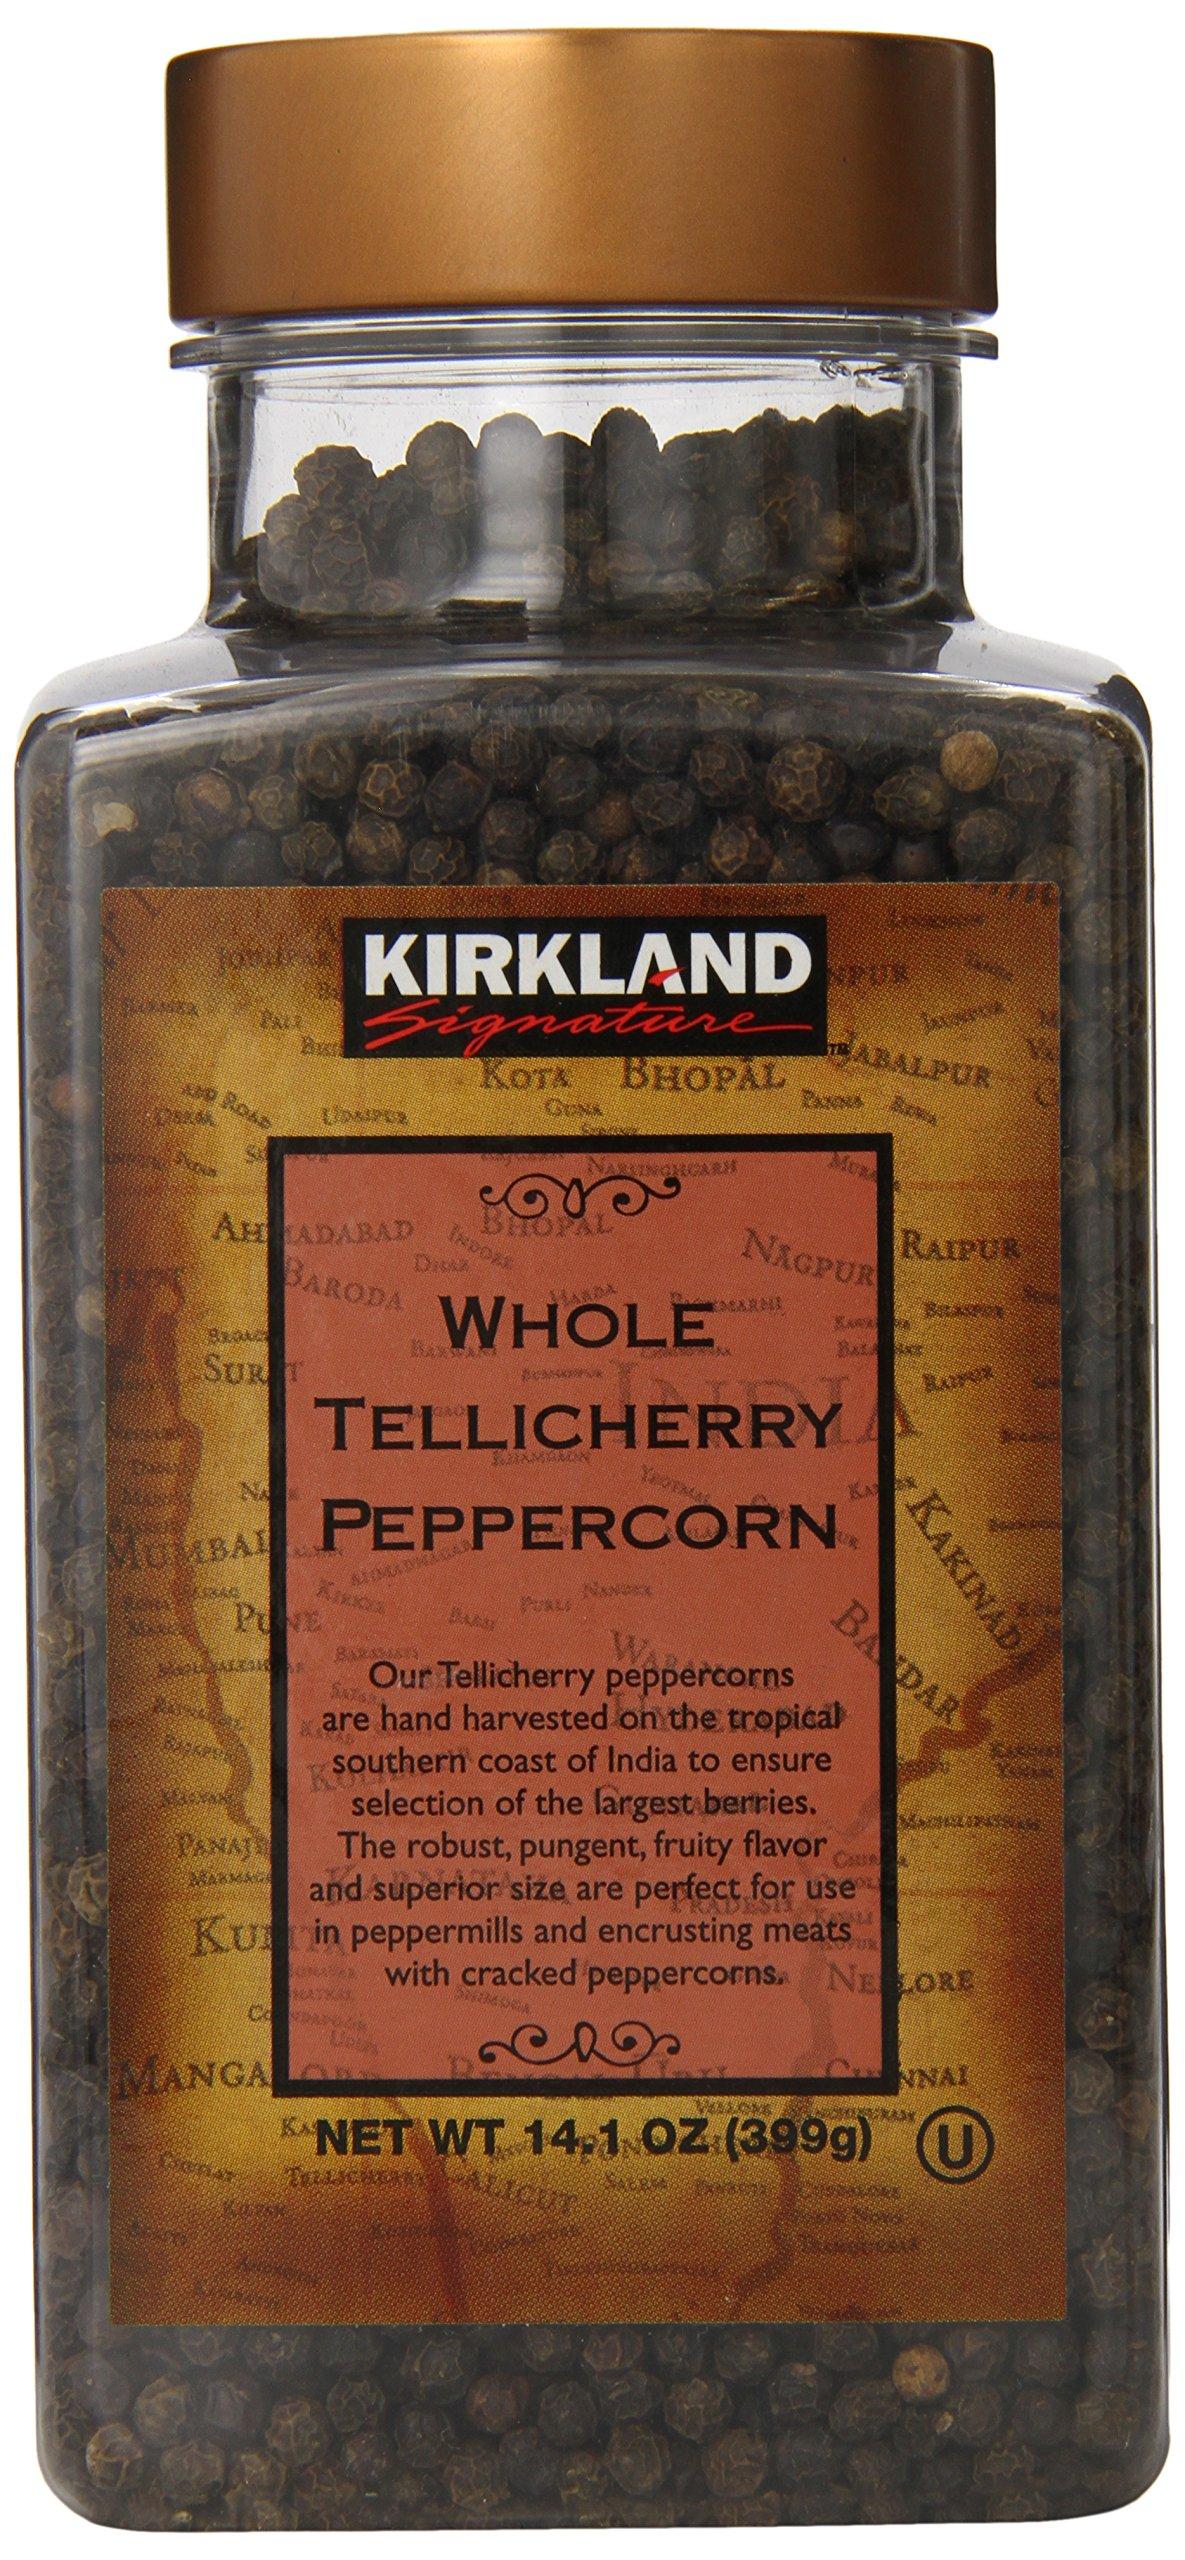 Kirkland Signature Whole Tellicherry Peppercorns, 14.1oz Gourmet Jar